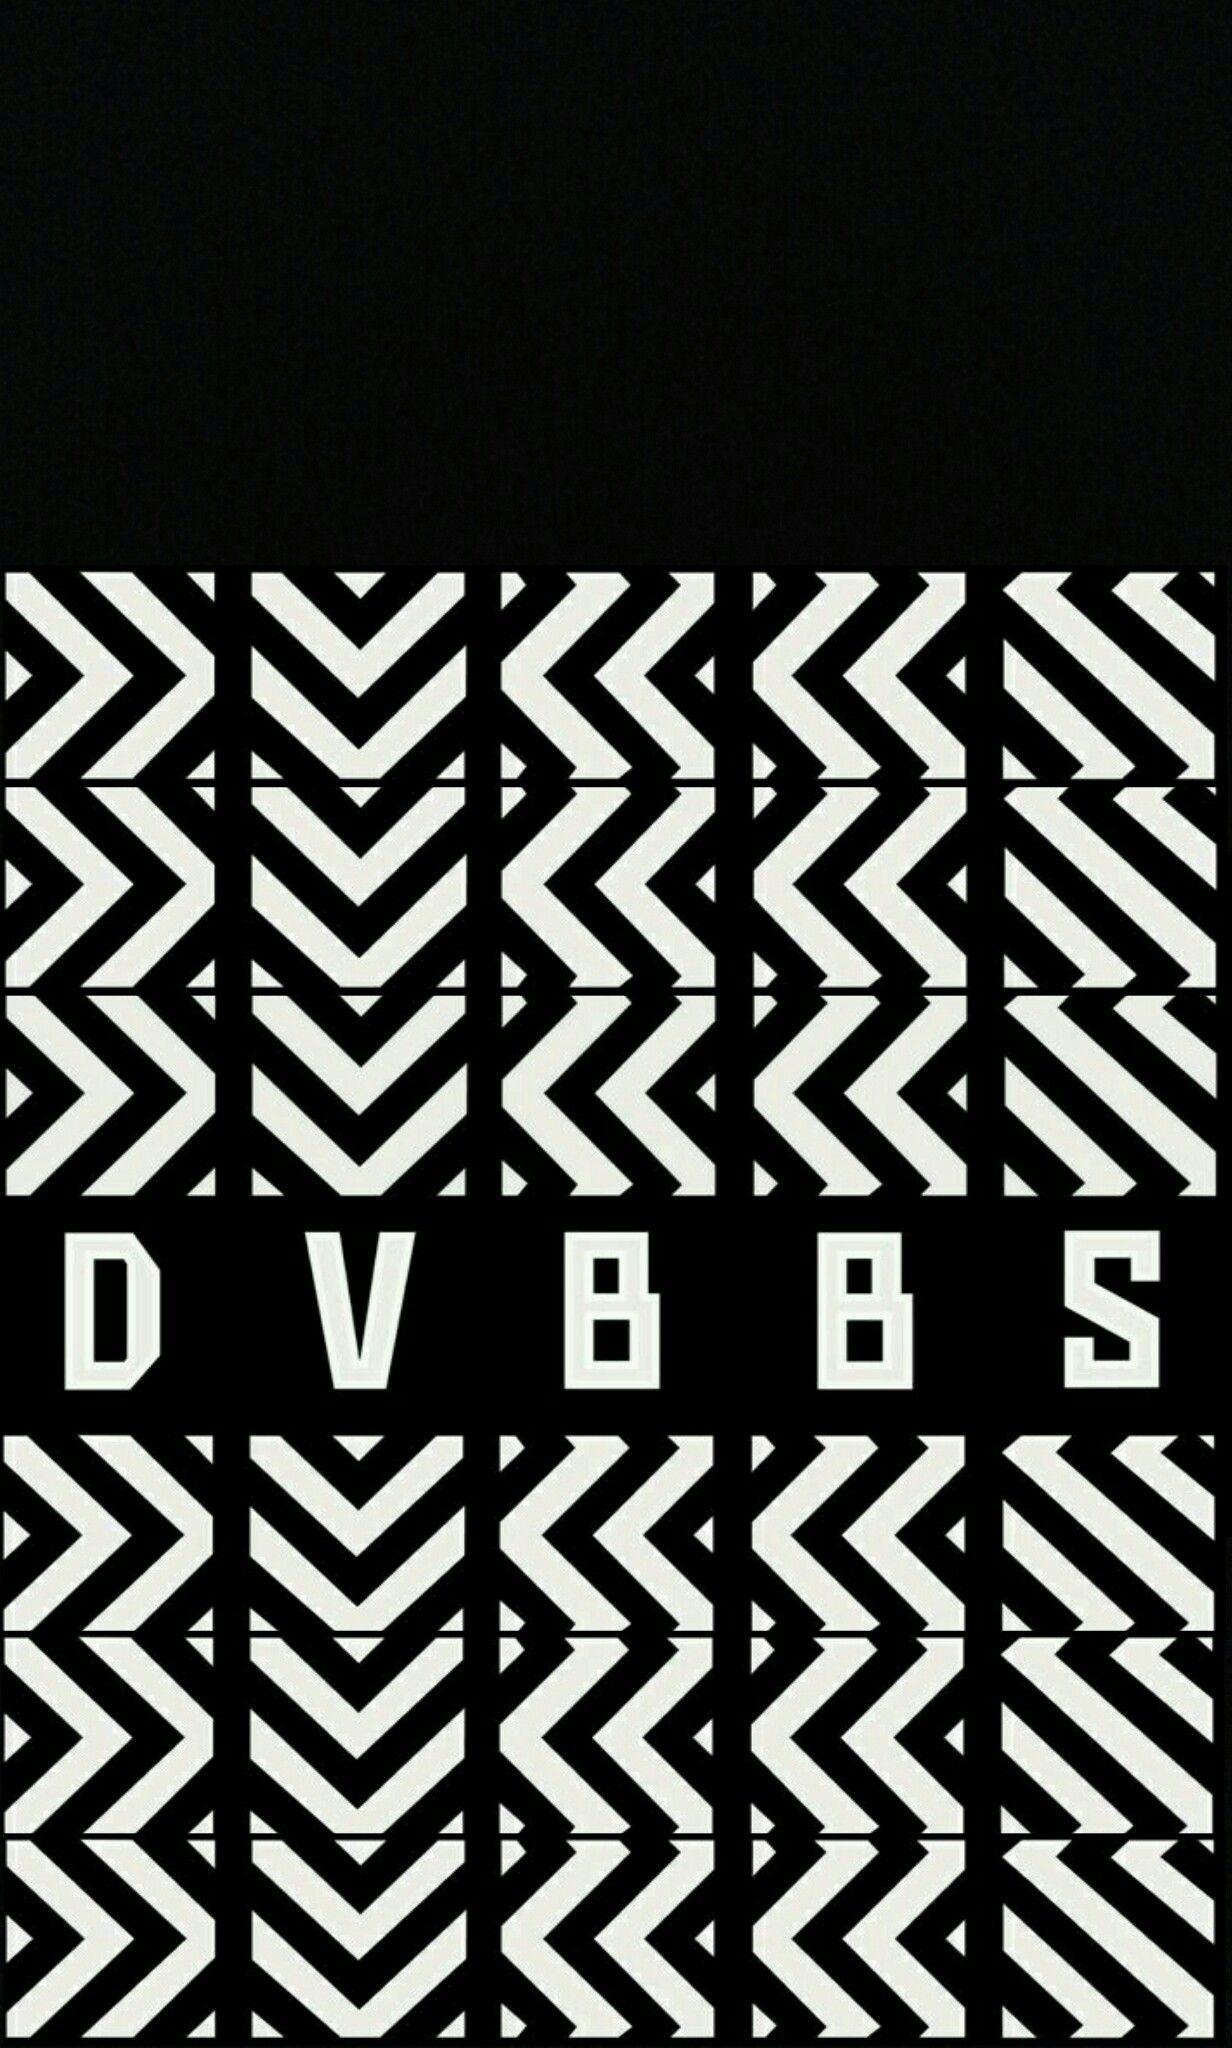 dvbbs logo walllaper dj pinterest logos electro music and edm